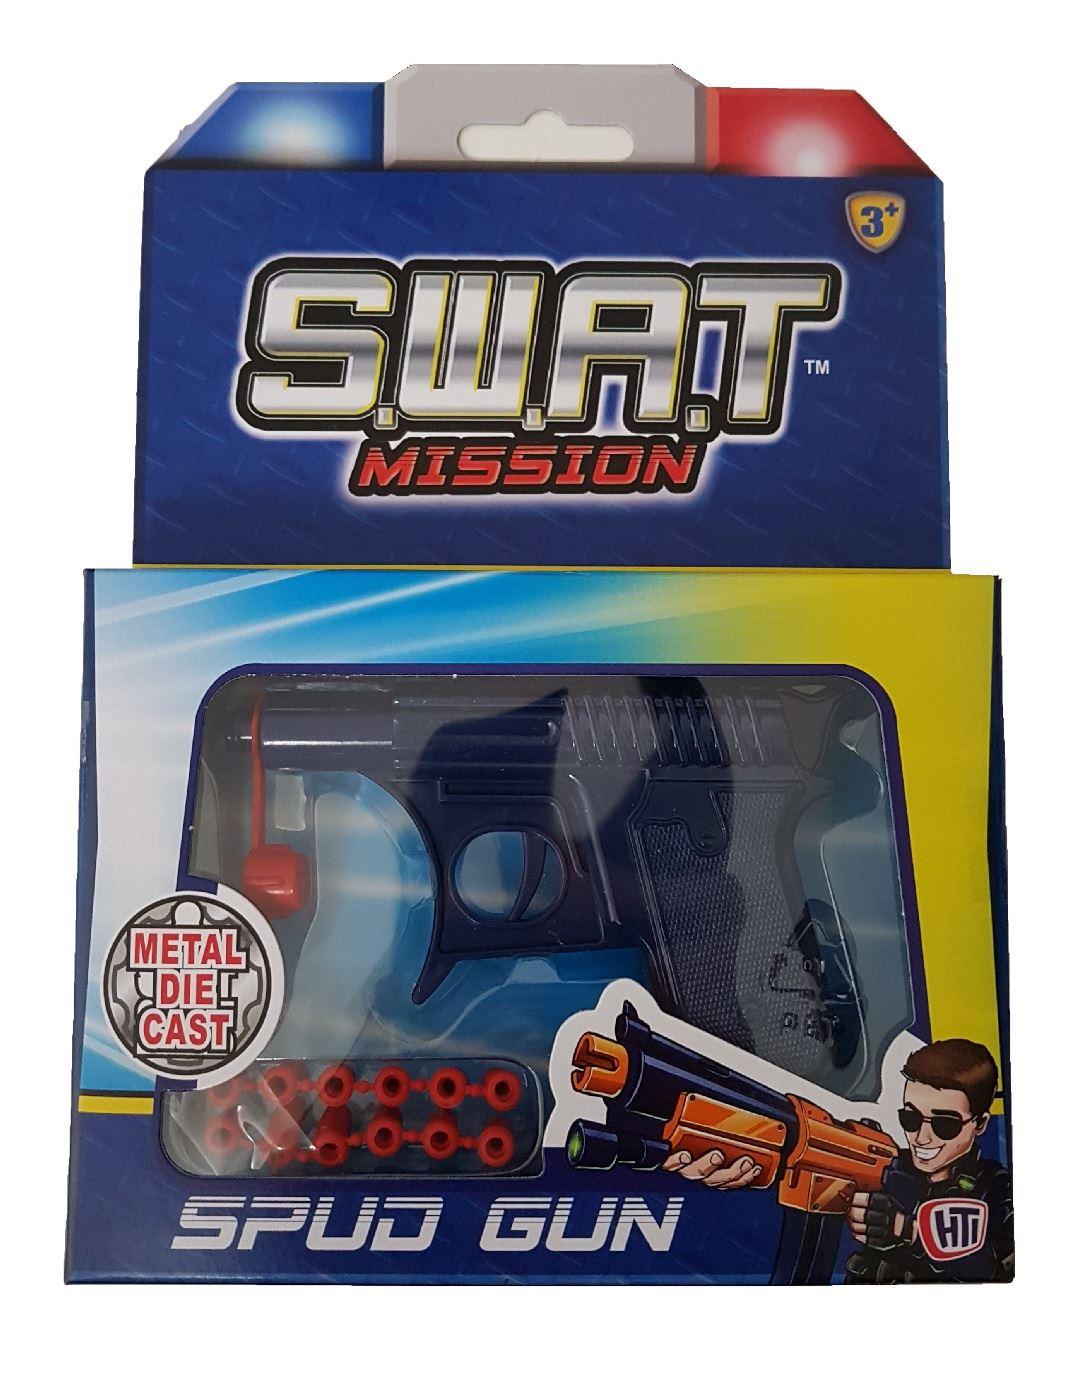 S.w.a.t Mission Spud Gun (blue) #31769